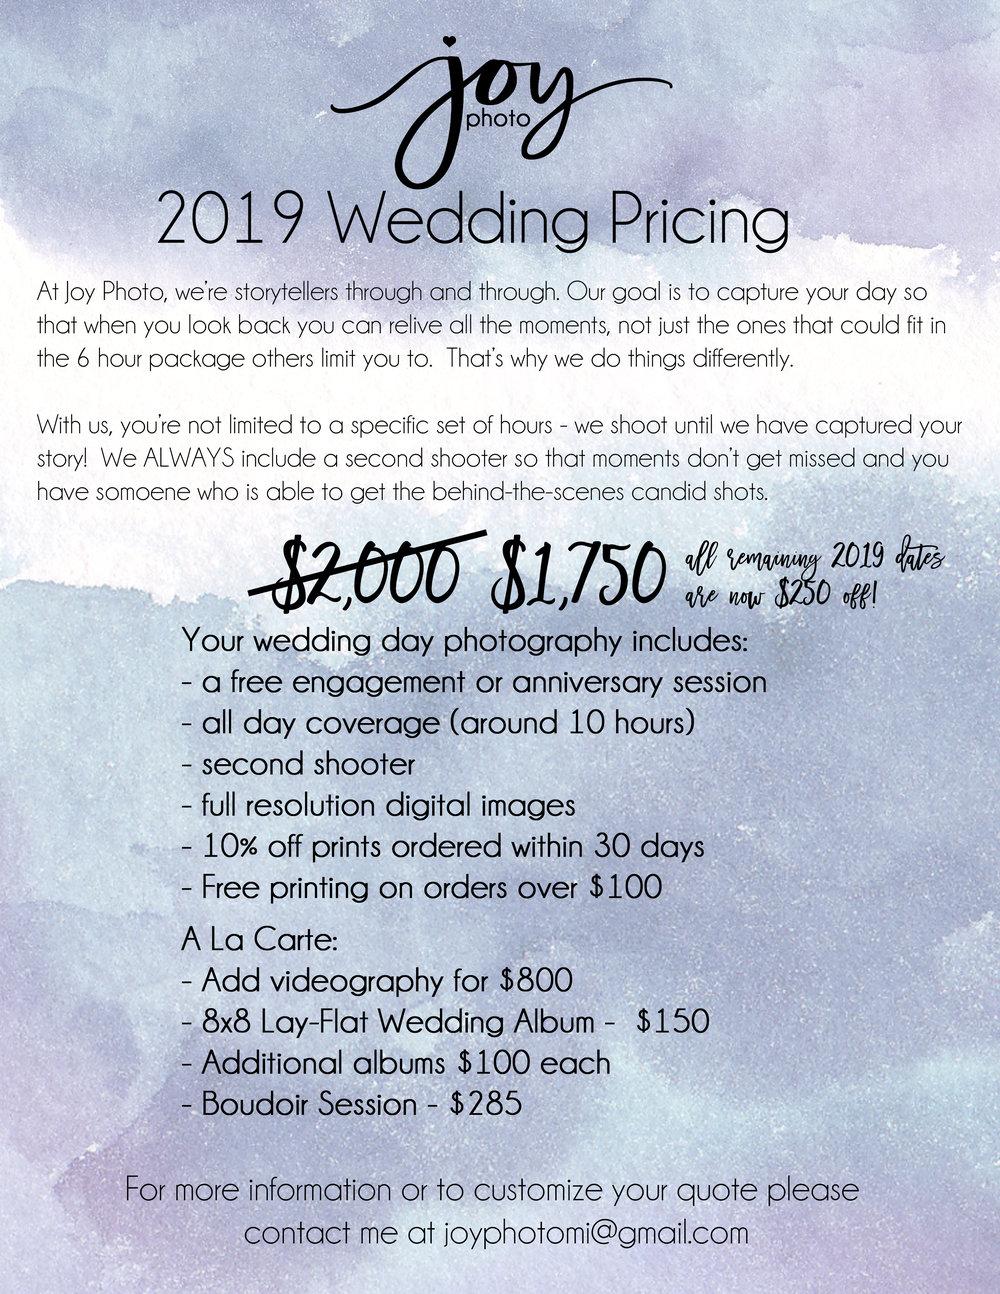 2019 Wedding Price.jpg